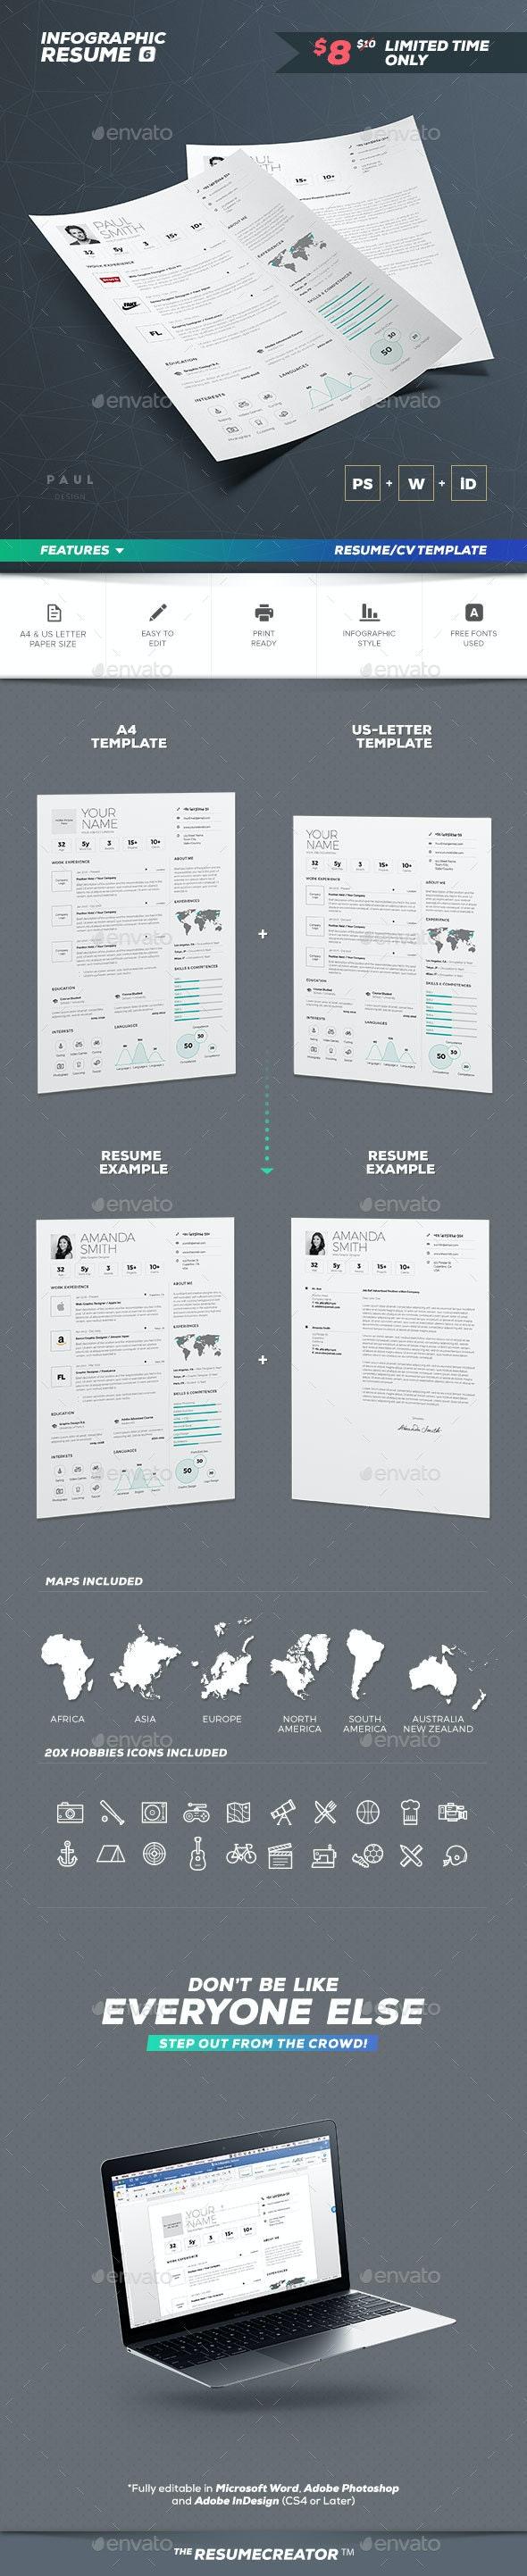 Infographic Resume/Cv Volume 6 - Resumes Stationery